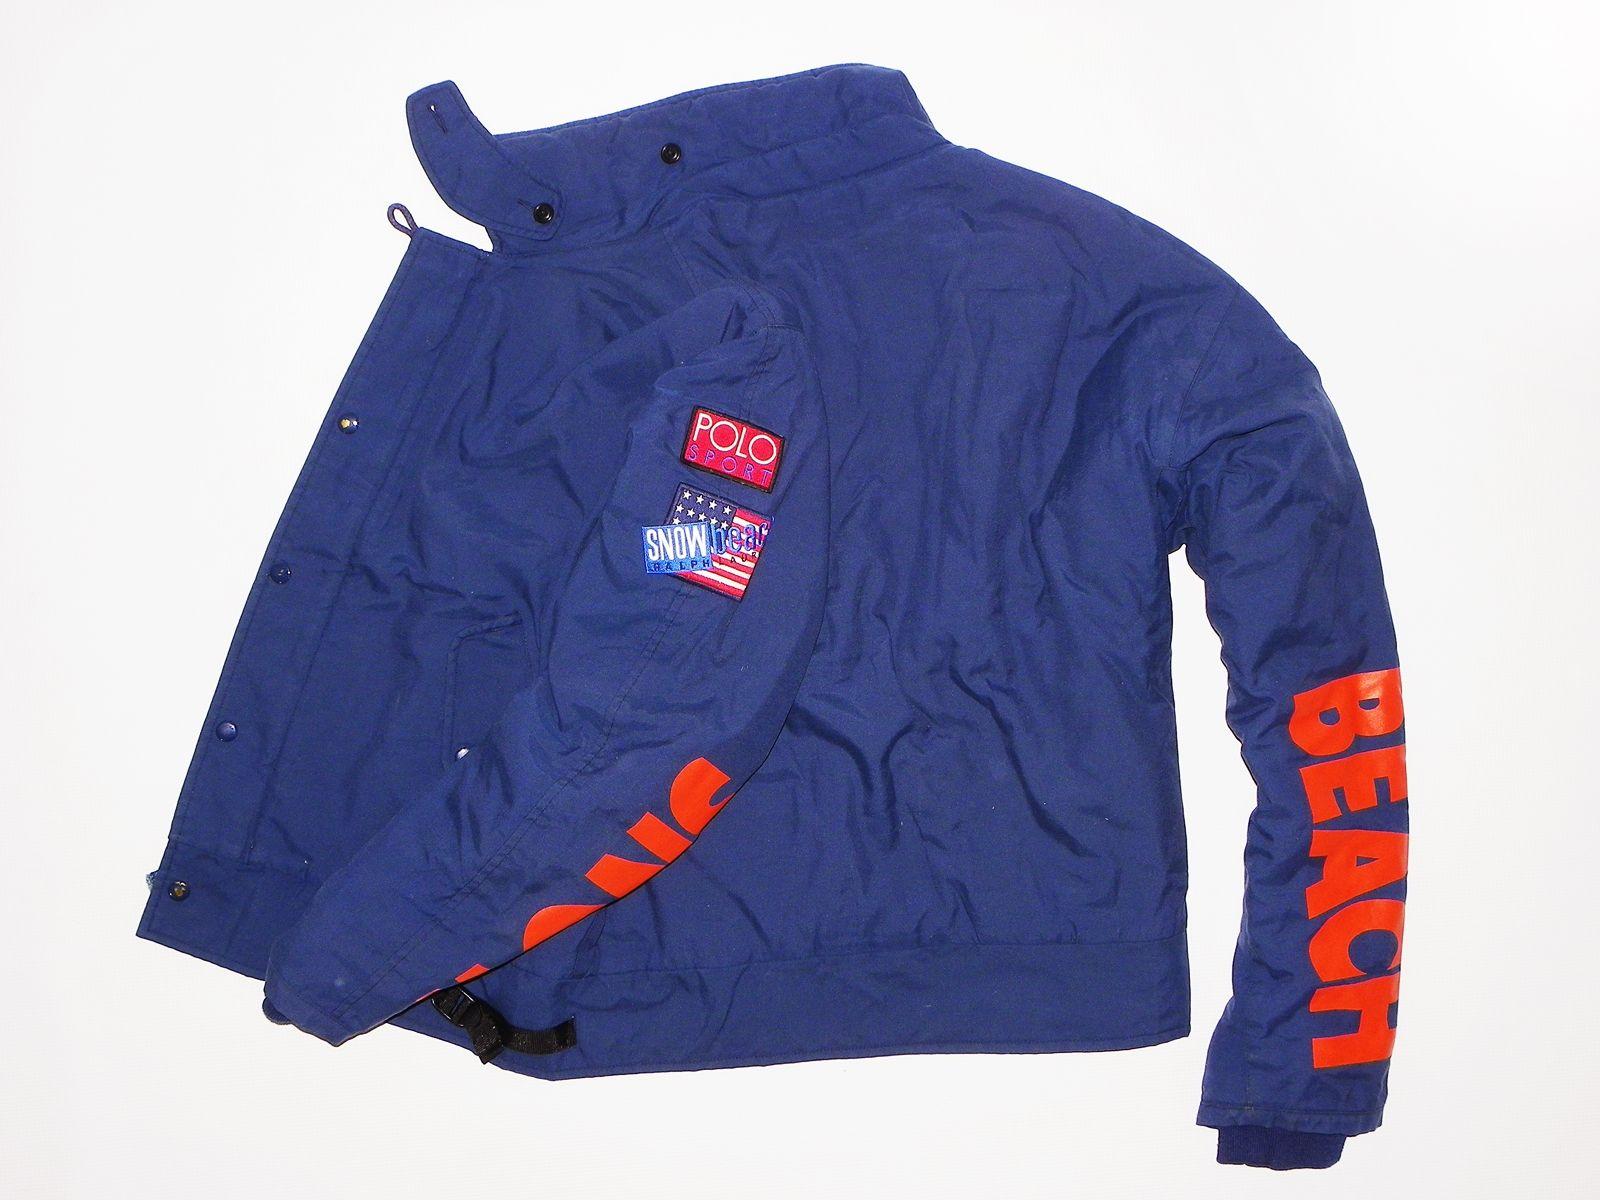 Vintage Polo Ralph Lauren Snow Beach Jacket For Sale Blue Bomber Jacket Polo Ralph Lauren Jackets [ 1200 x 1600 Pixel ]